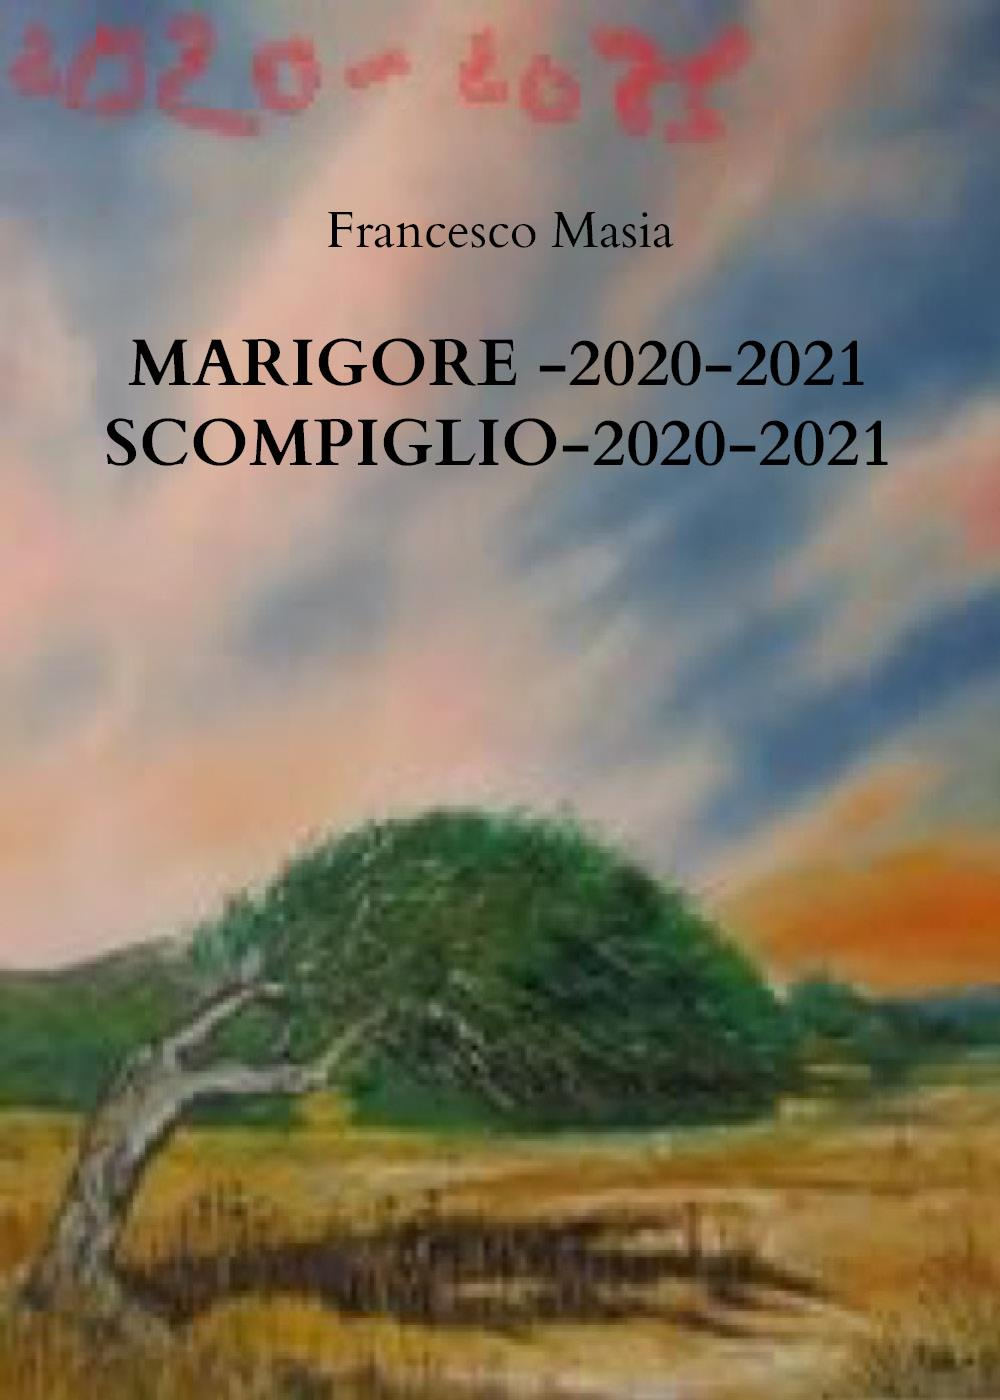 Marigore 2020-2021 Scompiglio 2020-2021